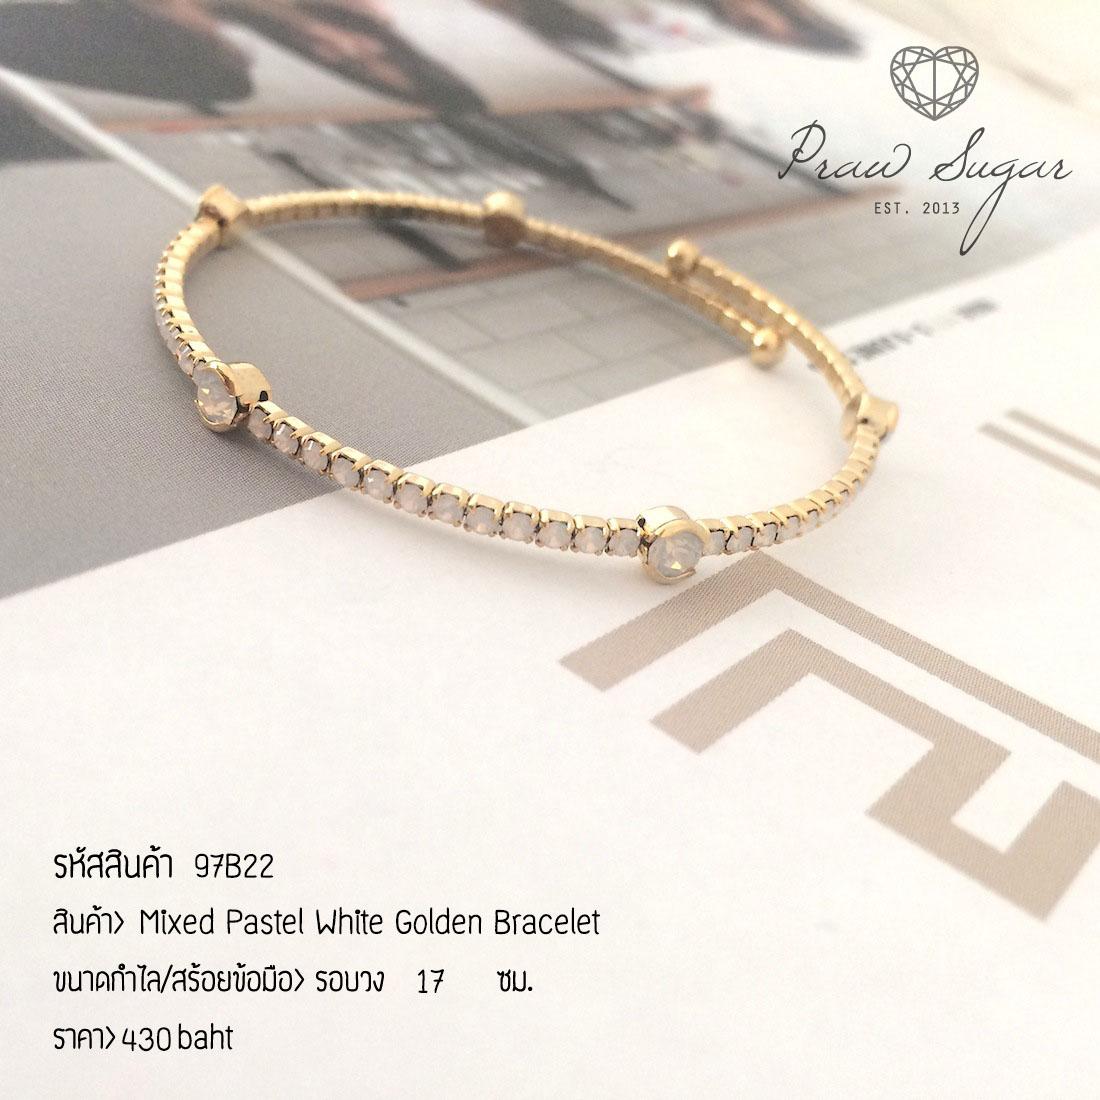 Mixed Pastel White Golden Bracelet